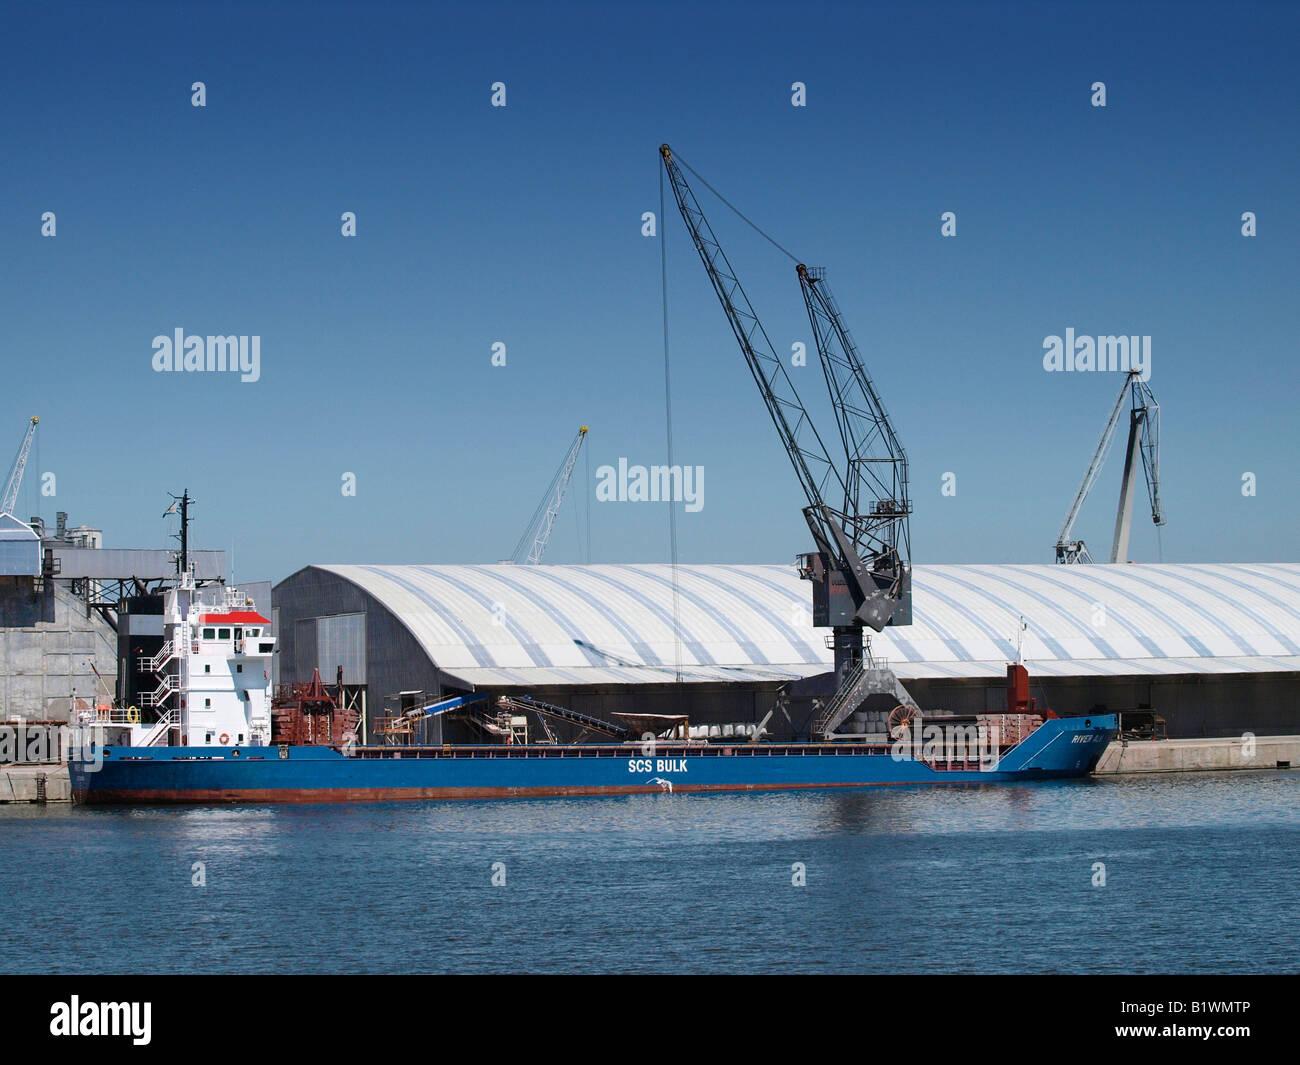 Bulk carrier ship in the port of Antwerp Flanders Belgium - Stock Image